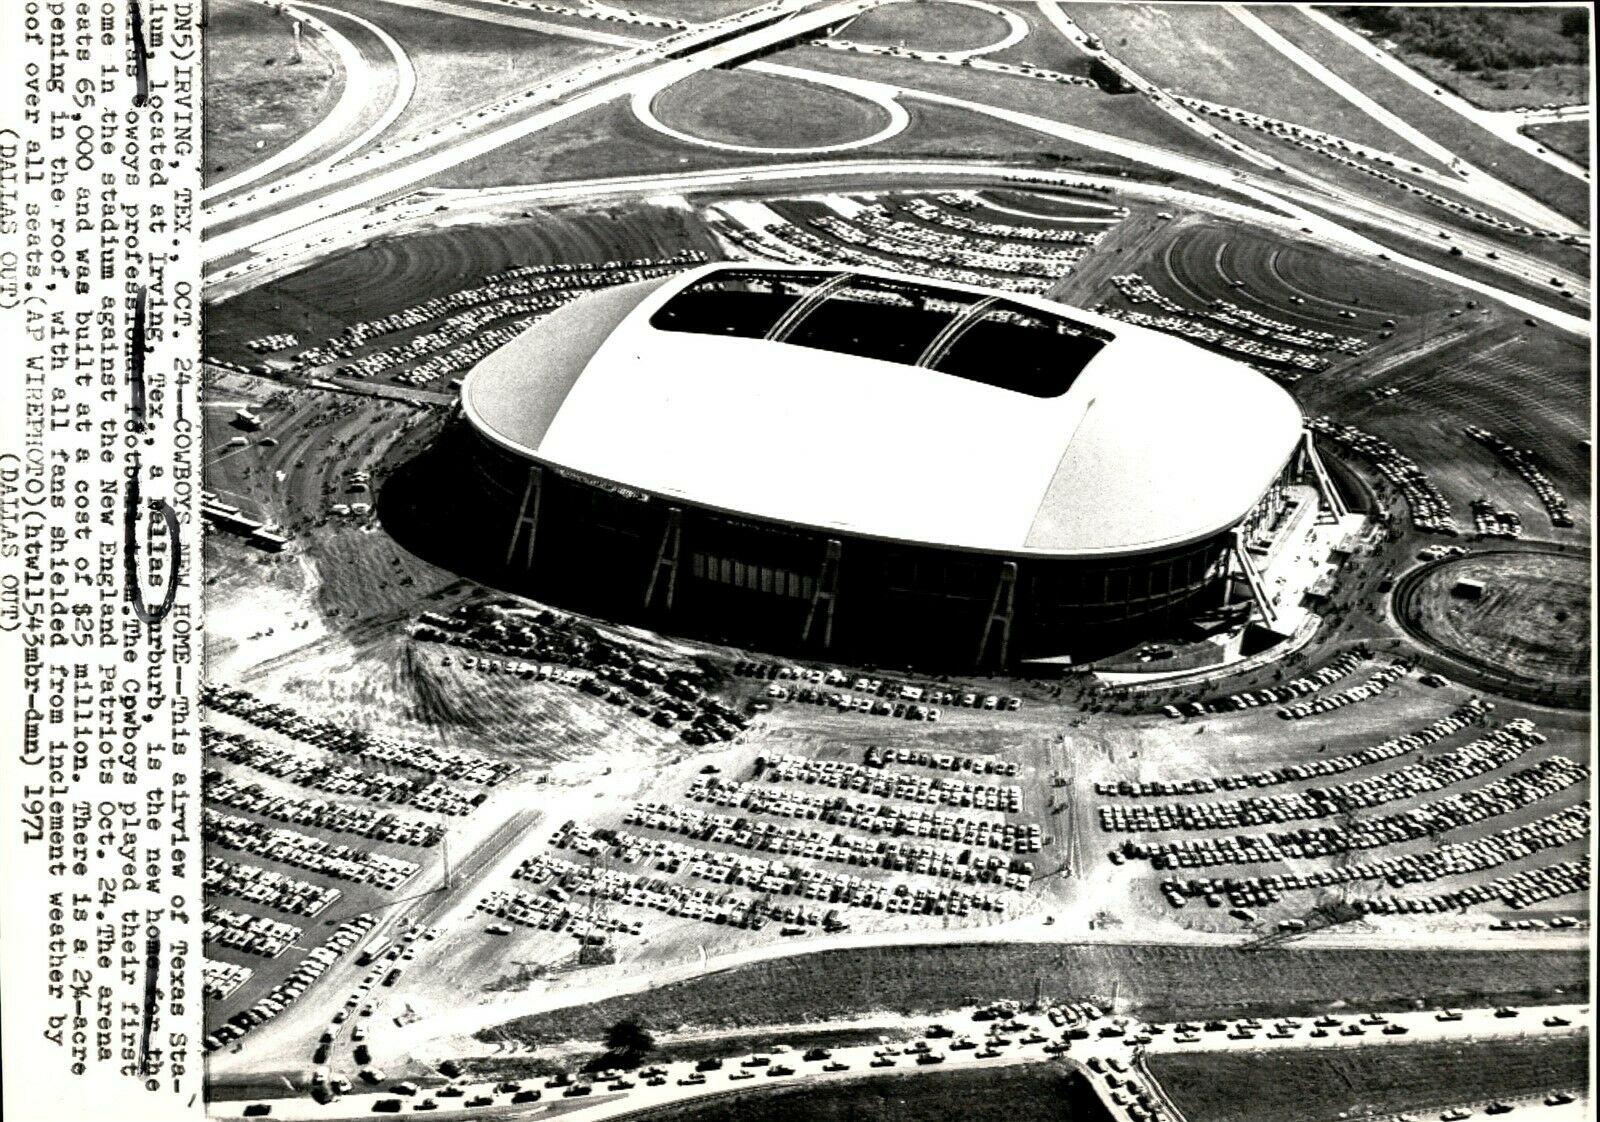 1971 press wire photo of Texas Stadium